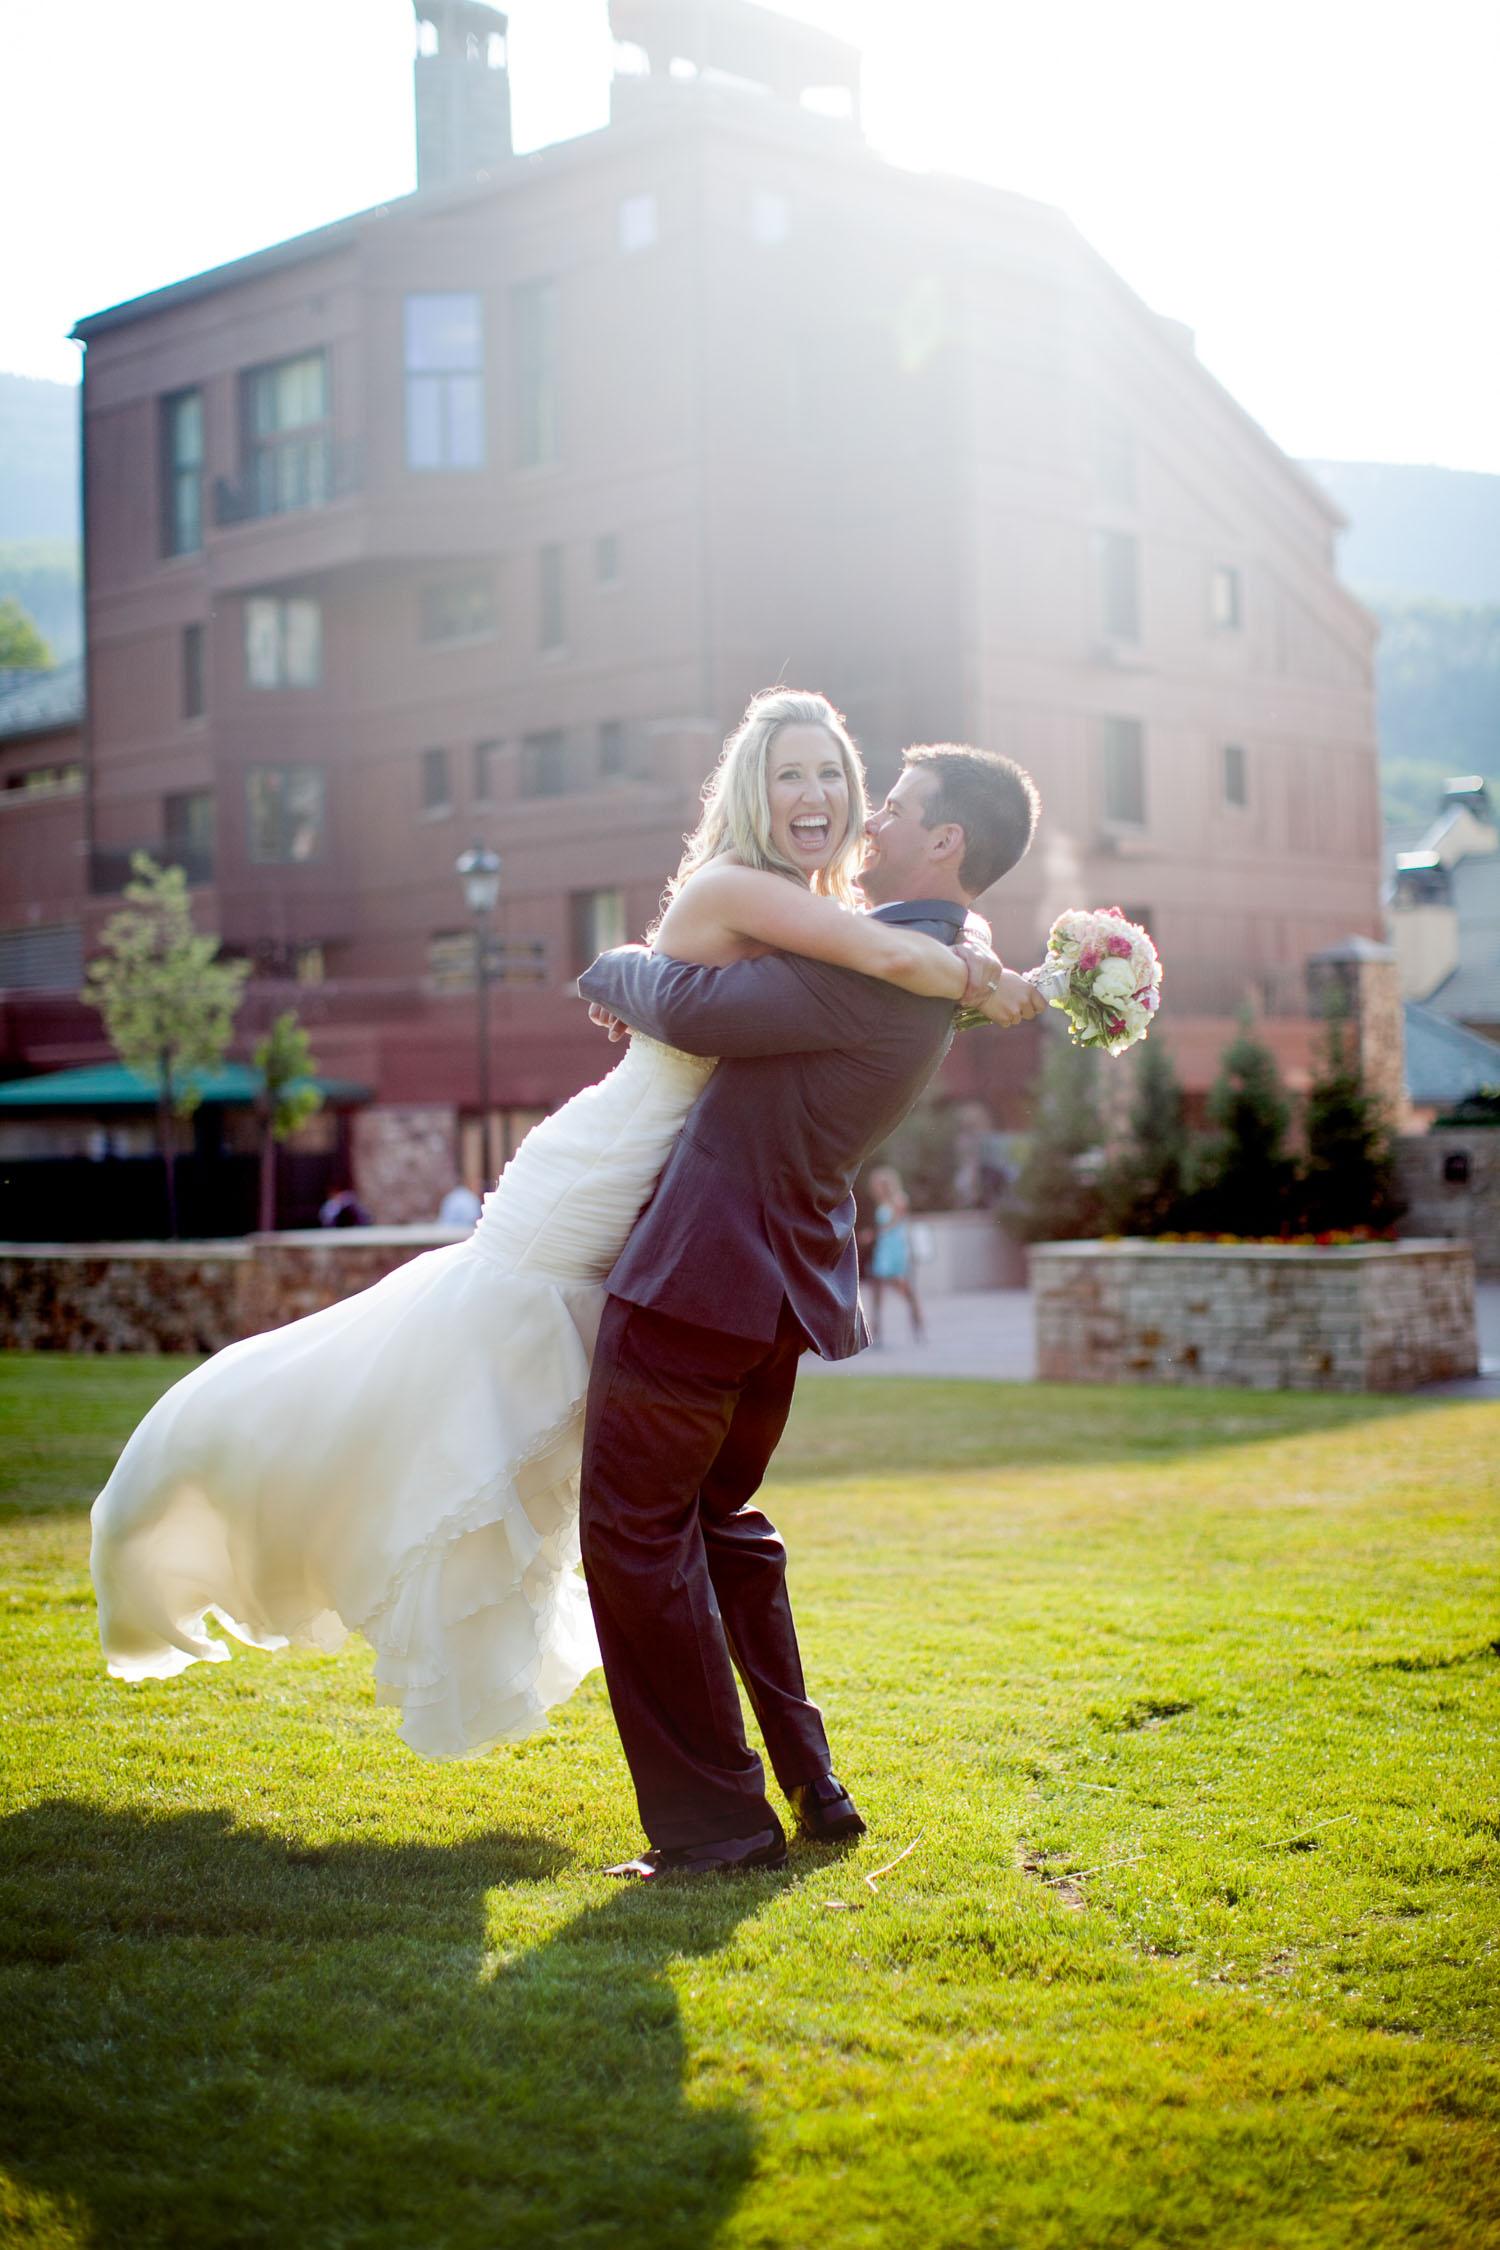 JMPHOTOART-Wedding-Photographer-150.jpg